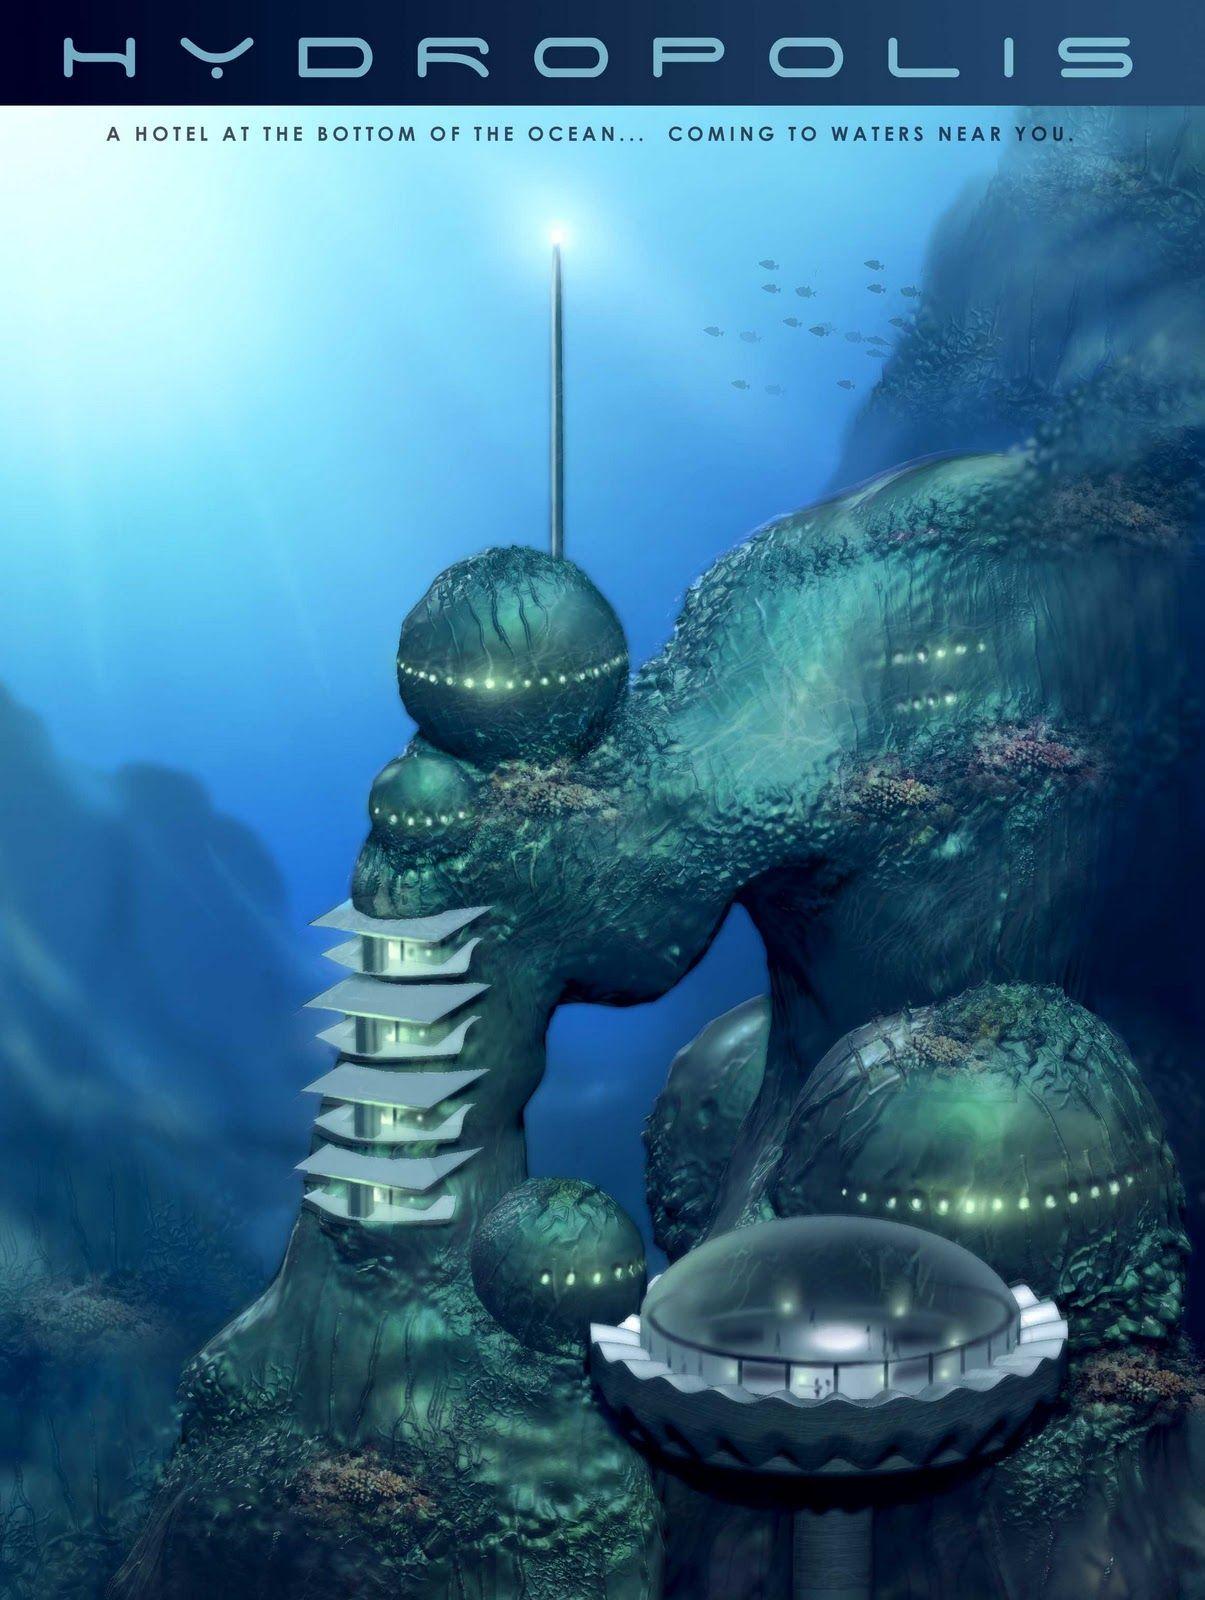 Hydropolis Underwater Hotel Greatest